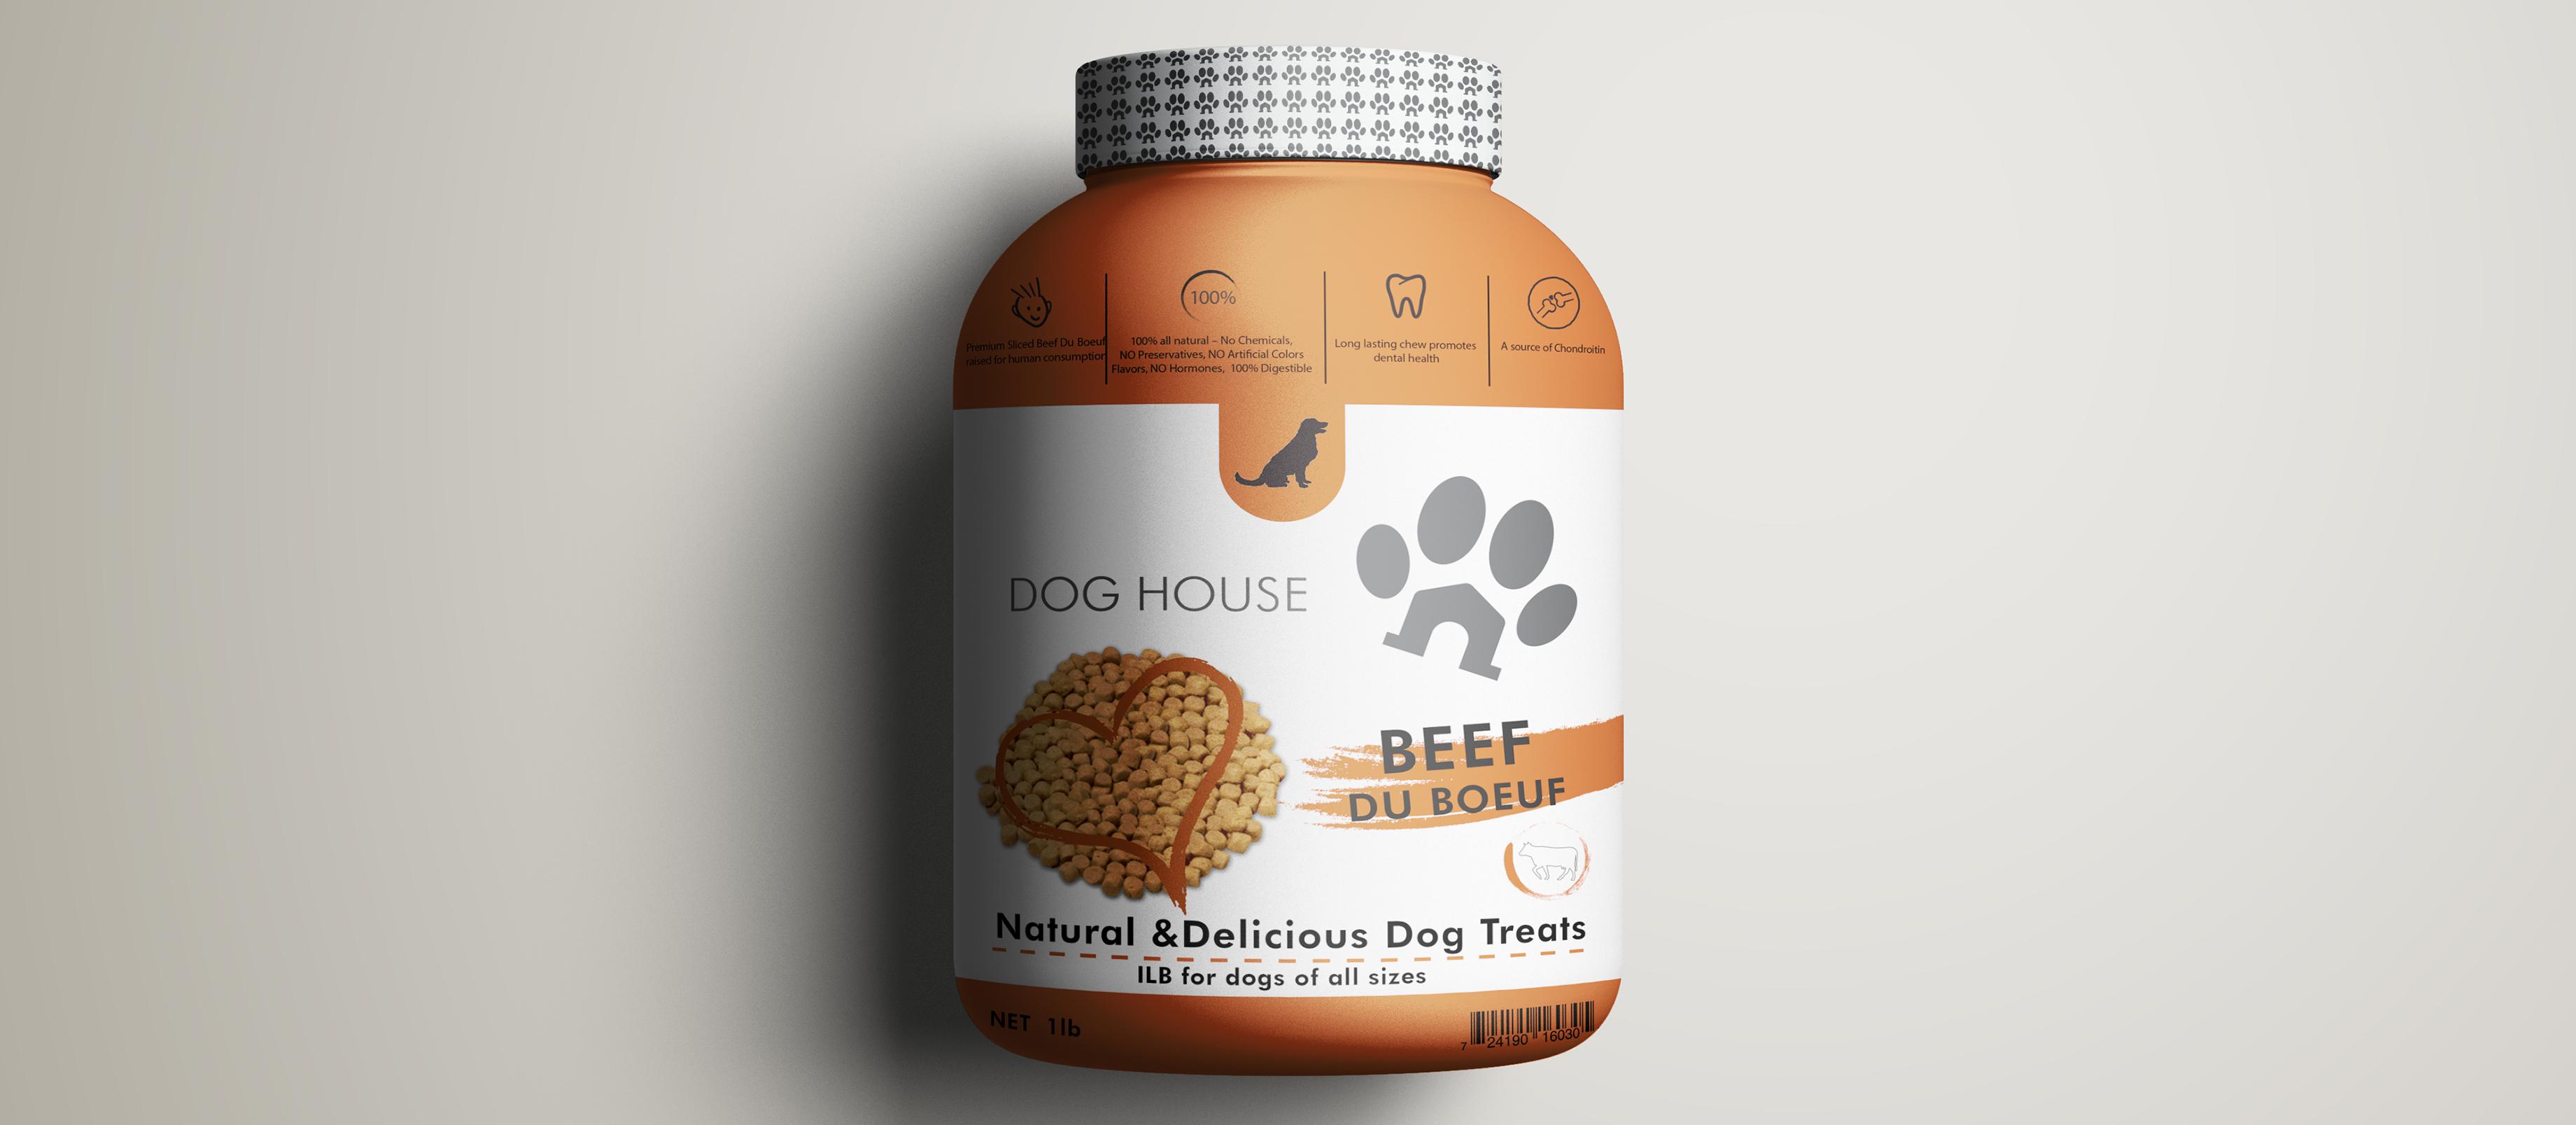 premium dog food branding https://www.linkedin.com/in/martin-andonov-445148163/